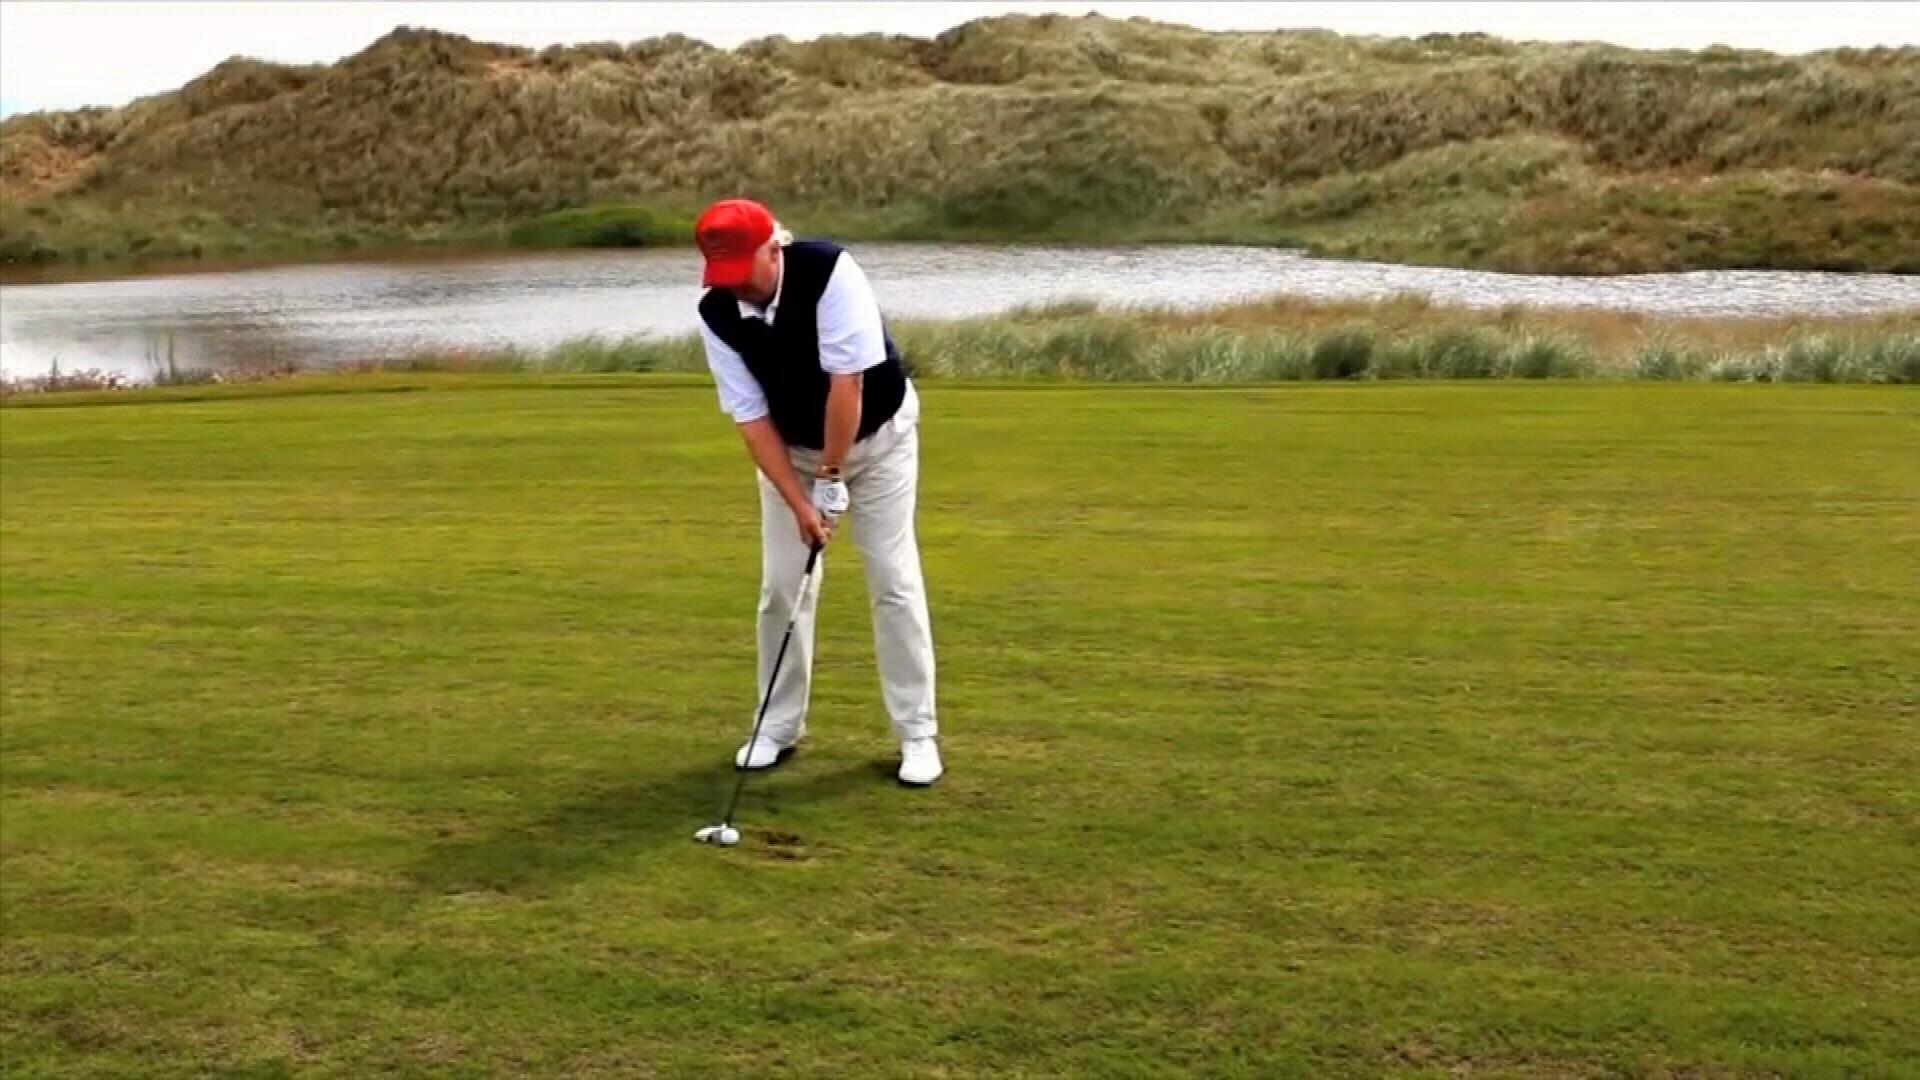 Battle over Trump's golf course dream